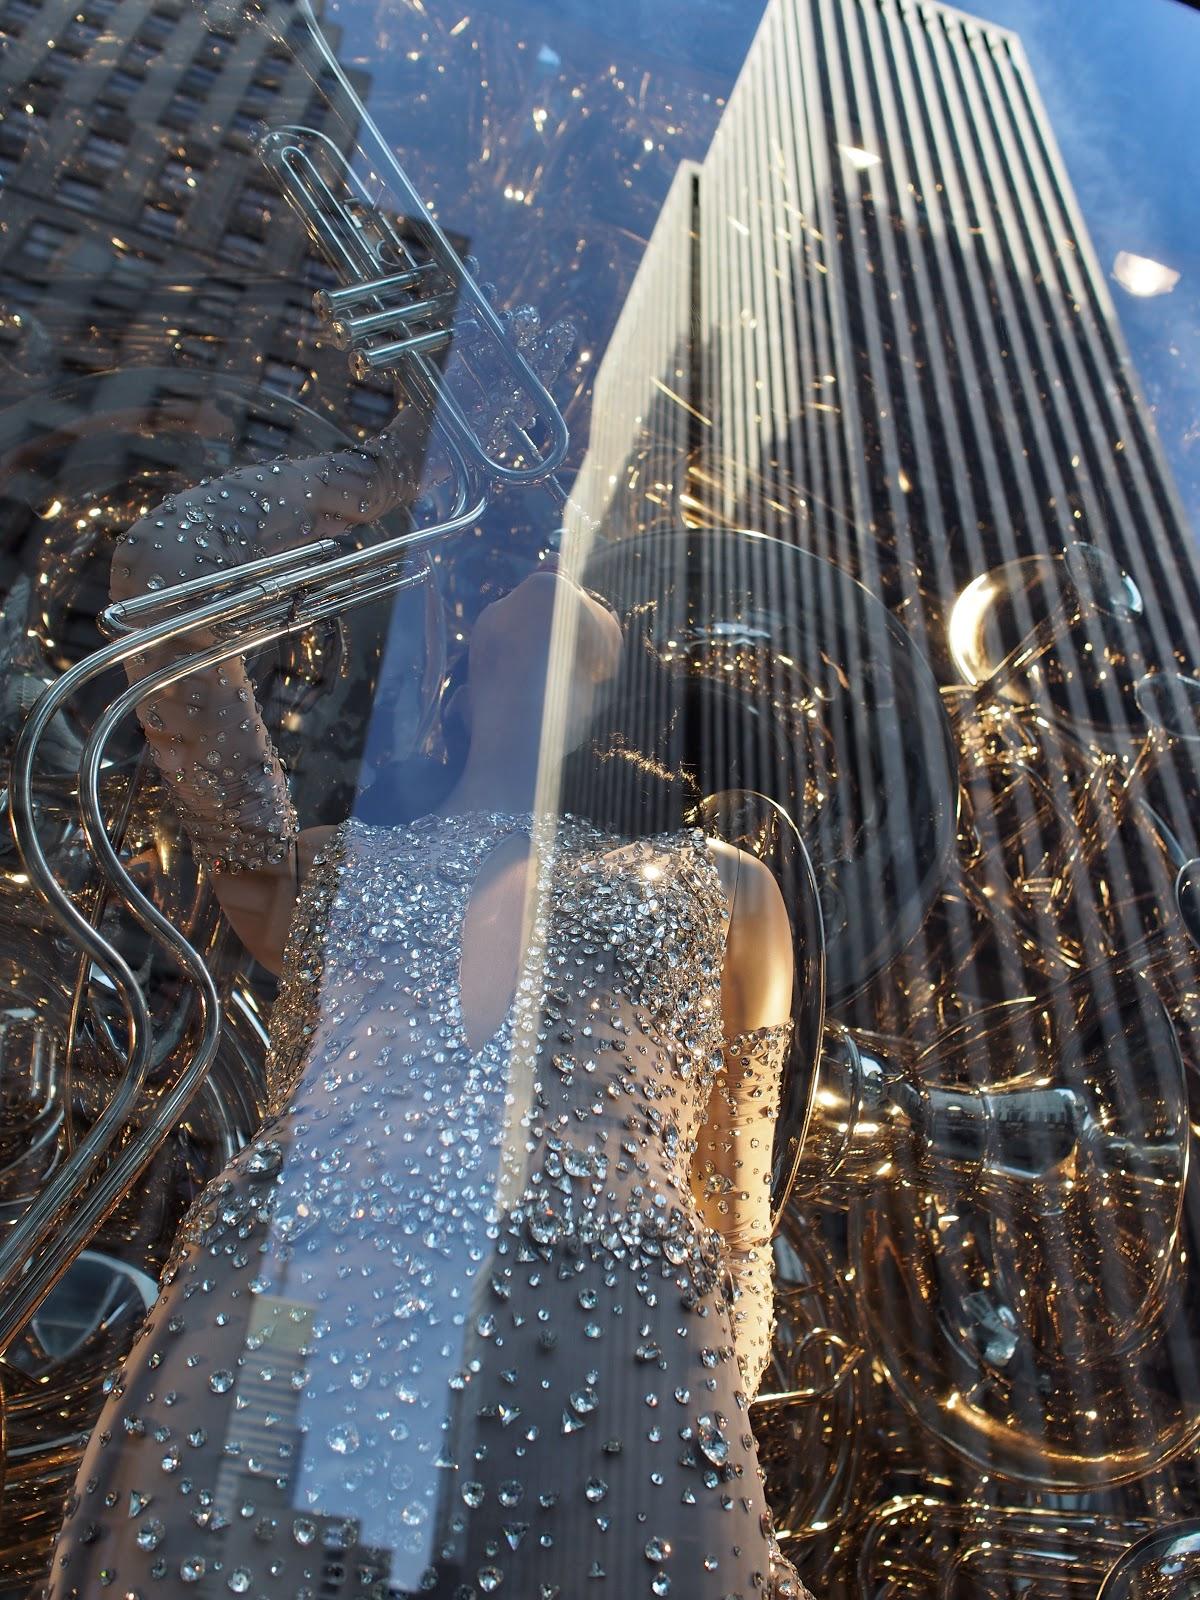 inspired by Music (Day) #inspiredbymusic(day) #bgwindows #windowwatchers #holidaywindows #5thavenuewindows #NYC  #holidays #besttimeoftheyear #nyc ©2014 Nancy Lundebjerg